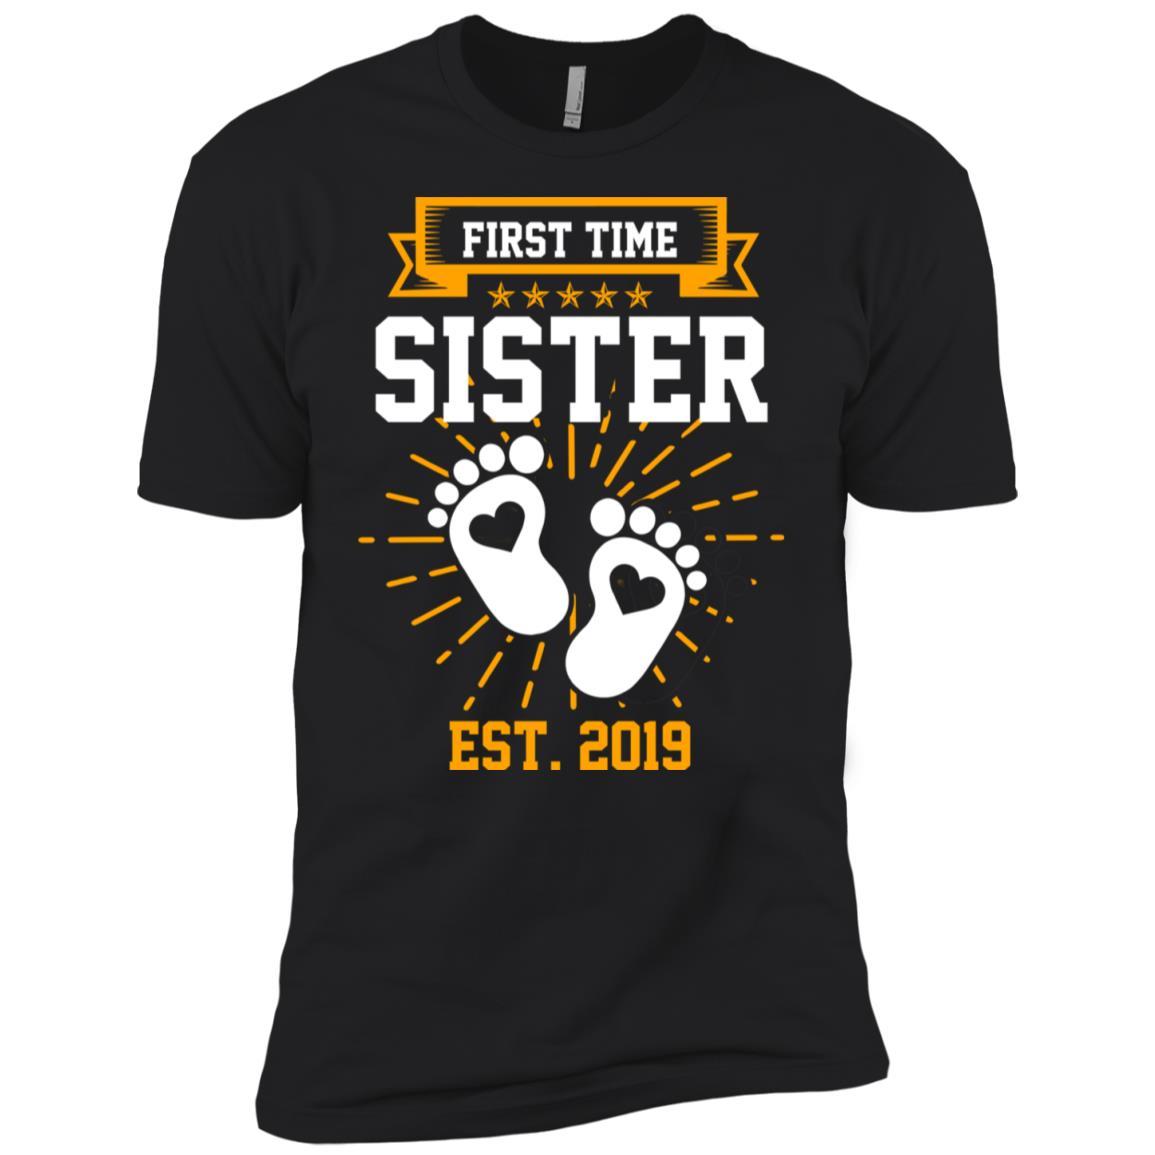 First Time Sister Est 2019 Gift Men Short Sleeve T-Shirt